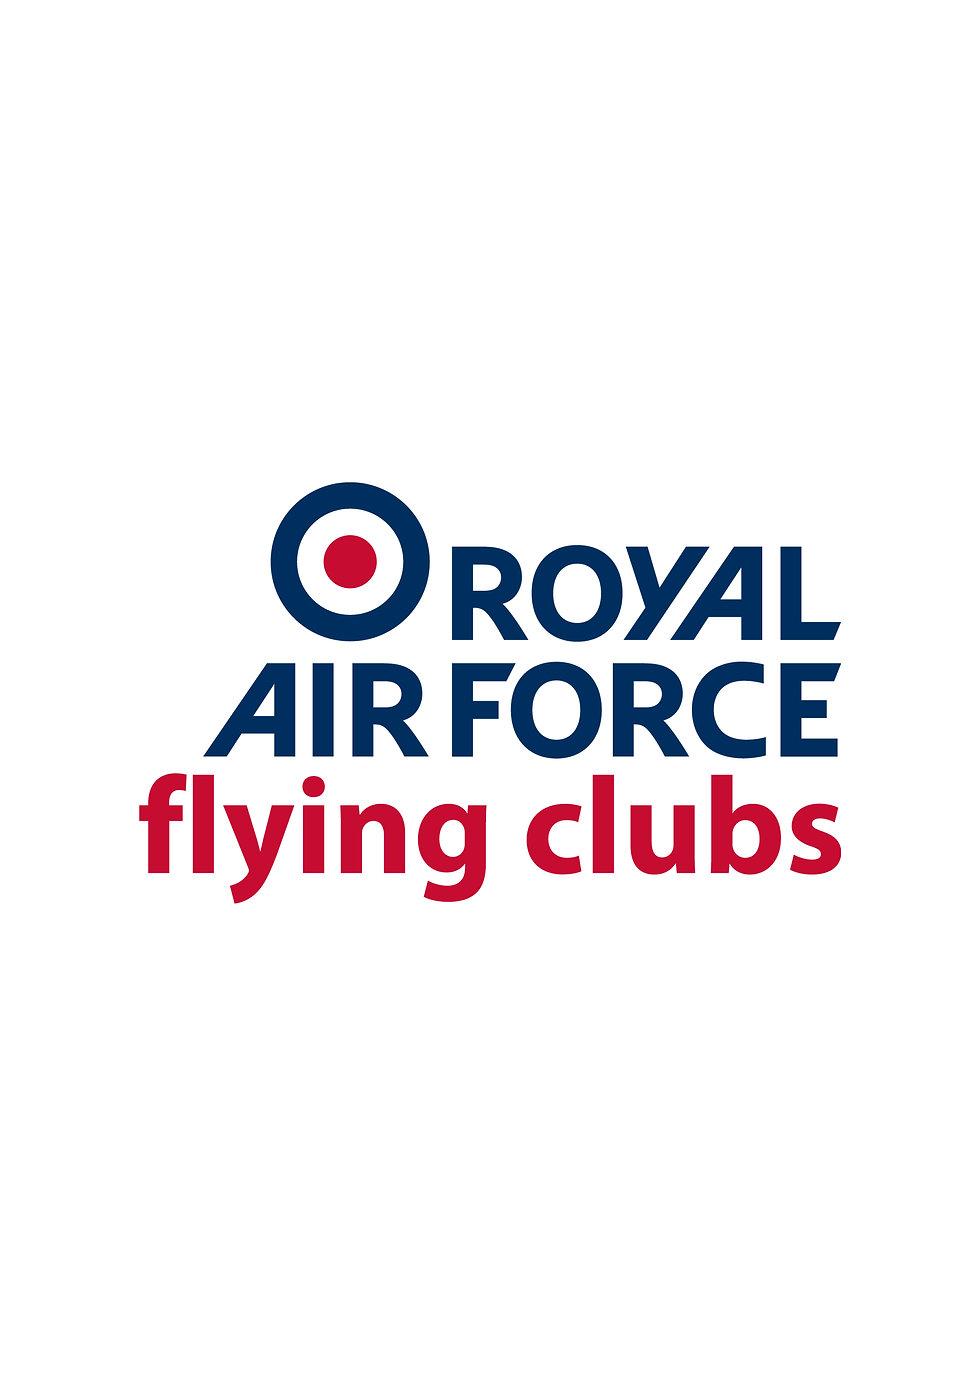 Royal Airforce Flying Club